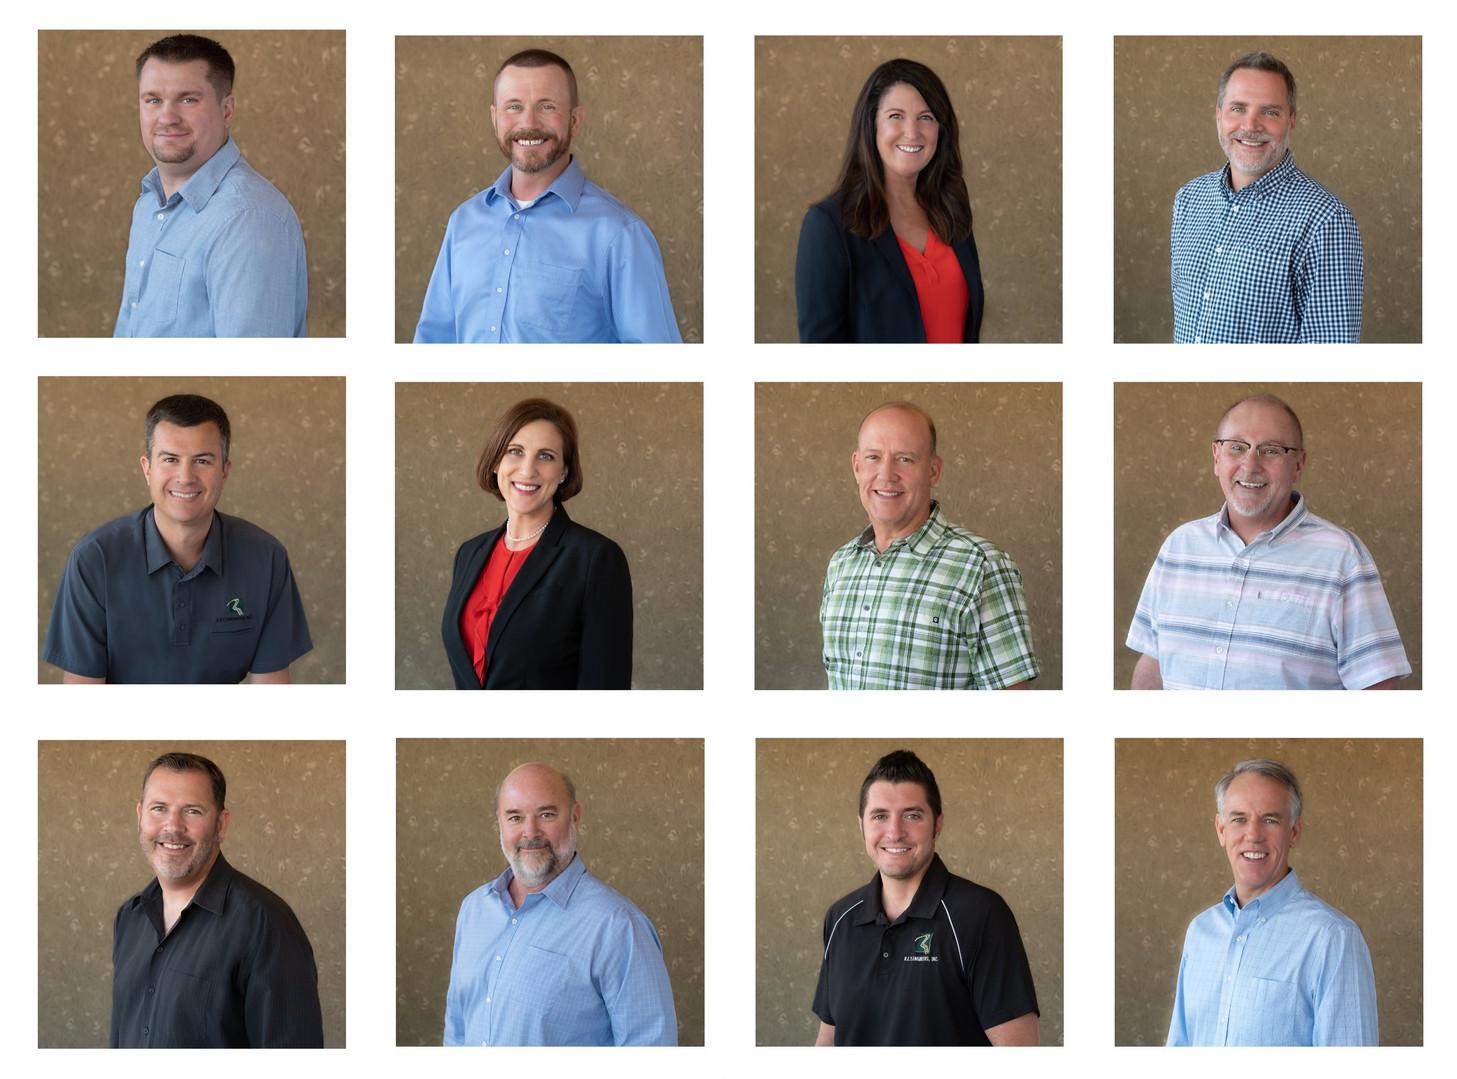 folsom-headshots-engineering-office-team